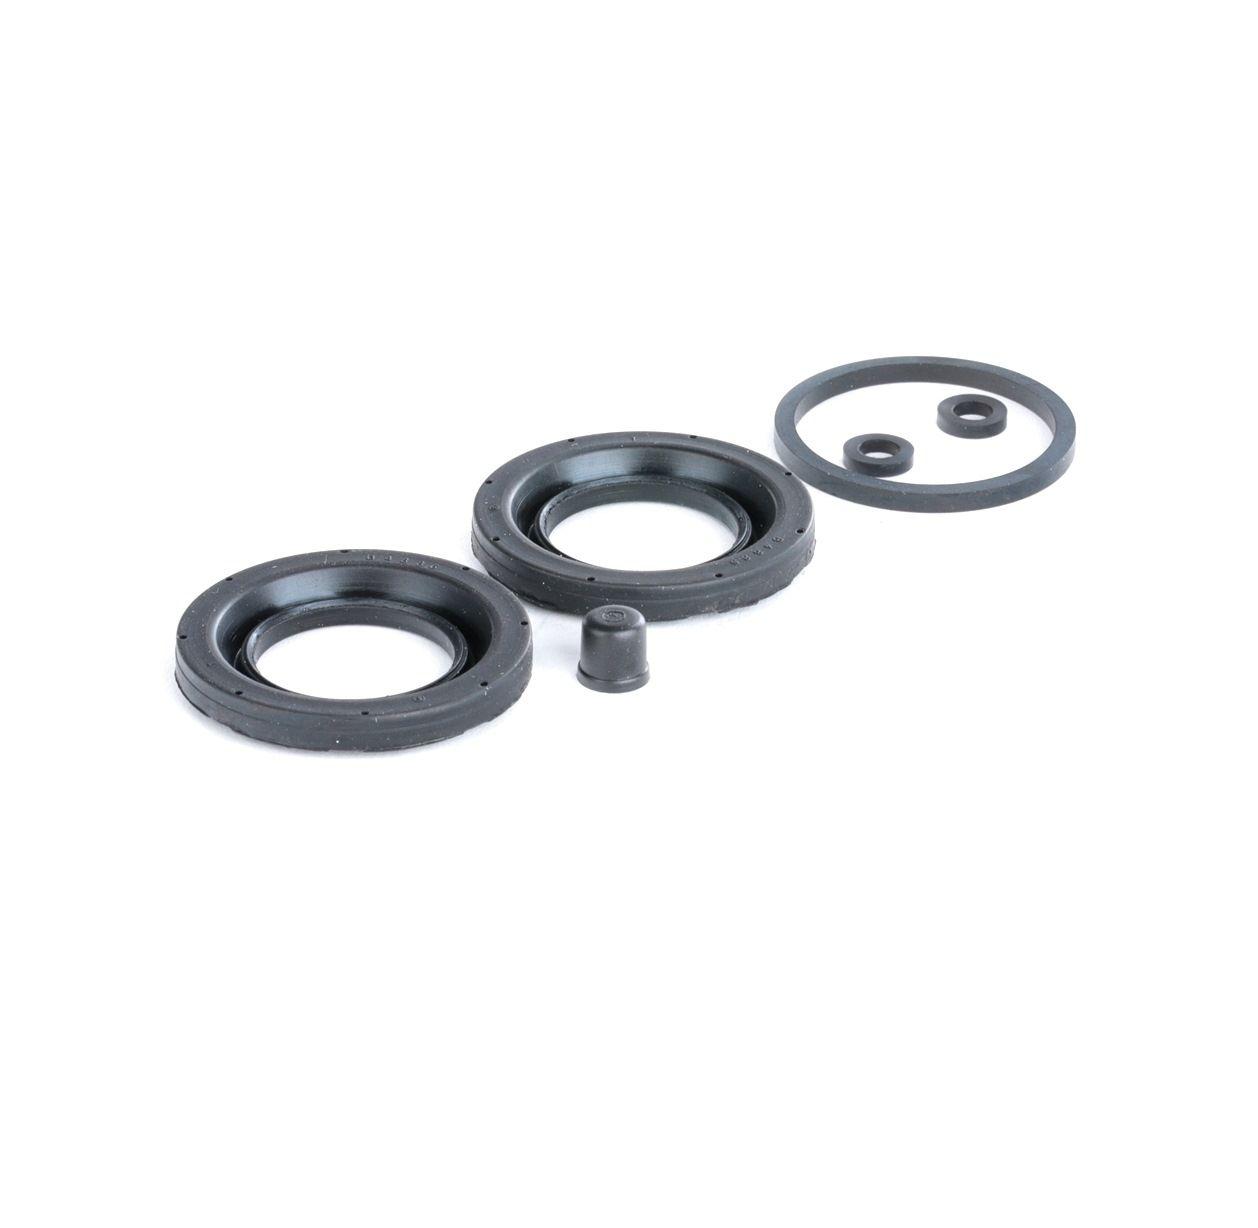 brake caliper Autofren Seinsa D4096 Repair Kit